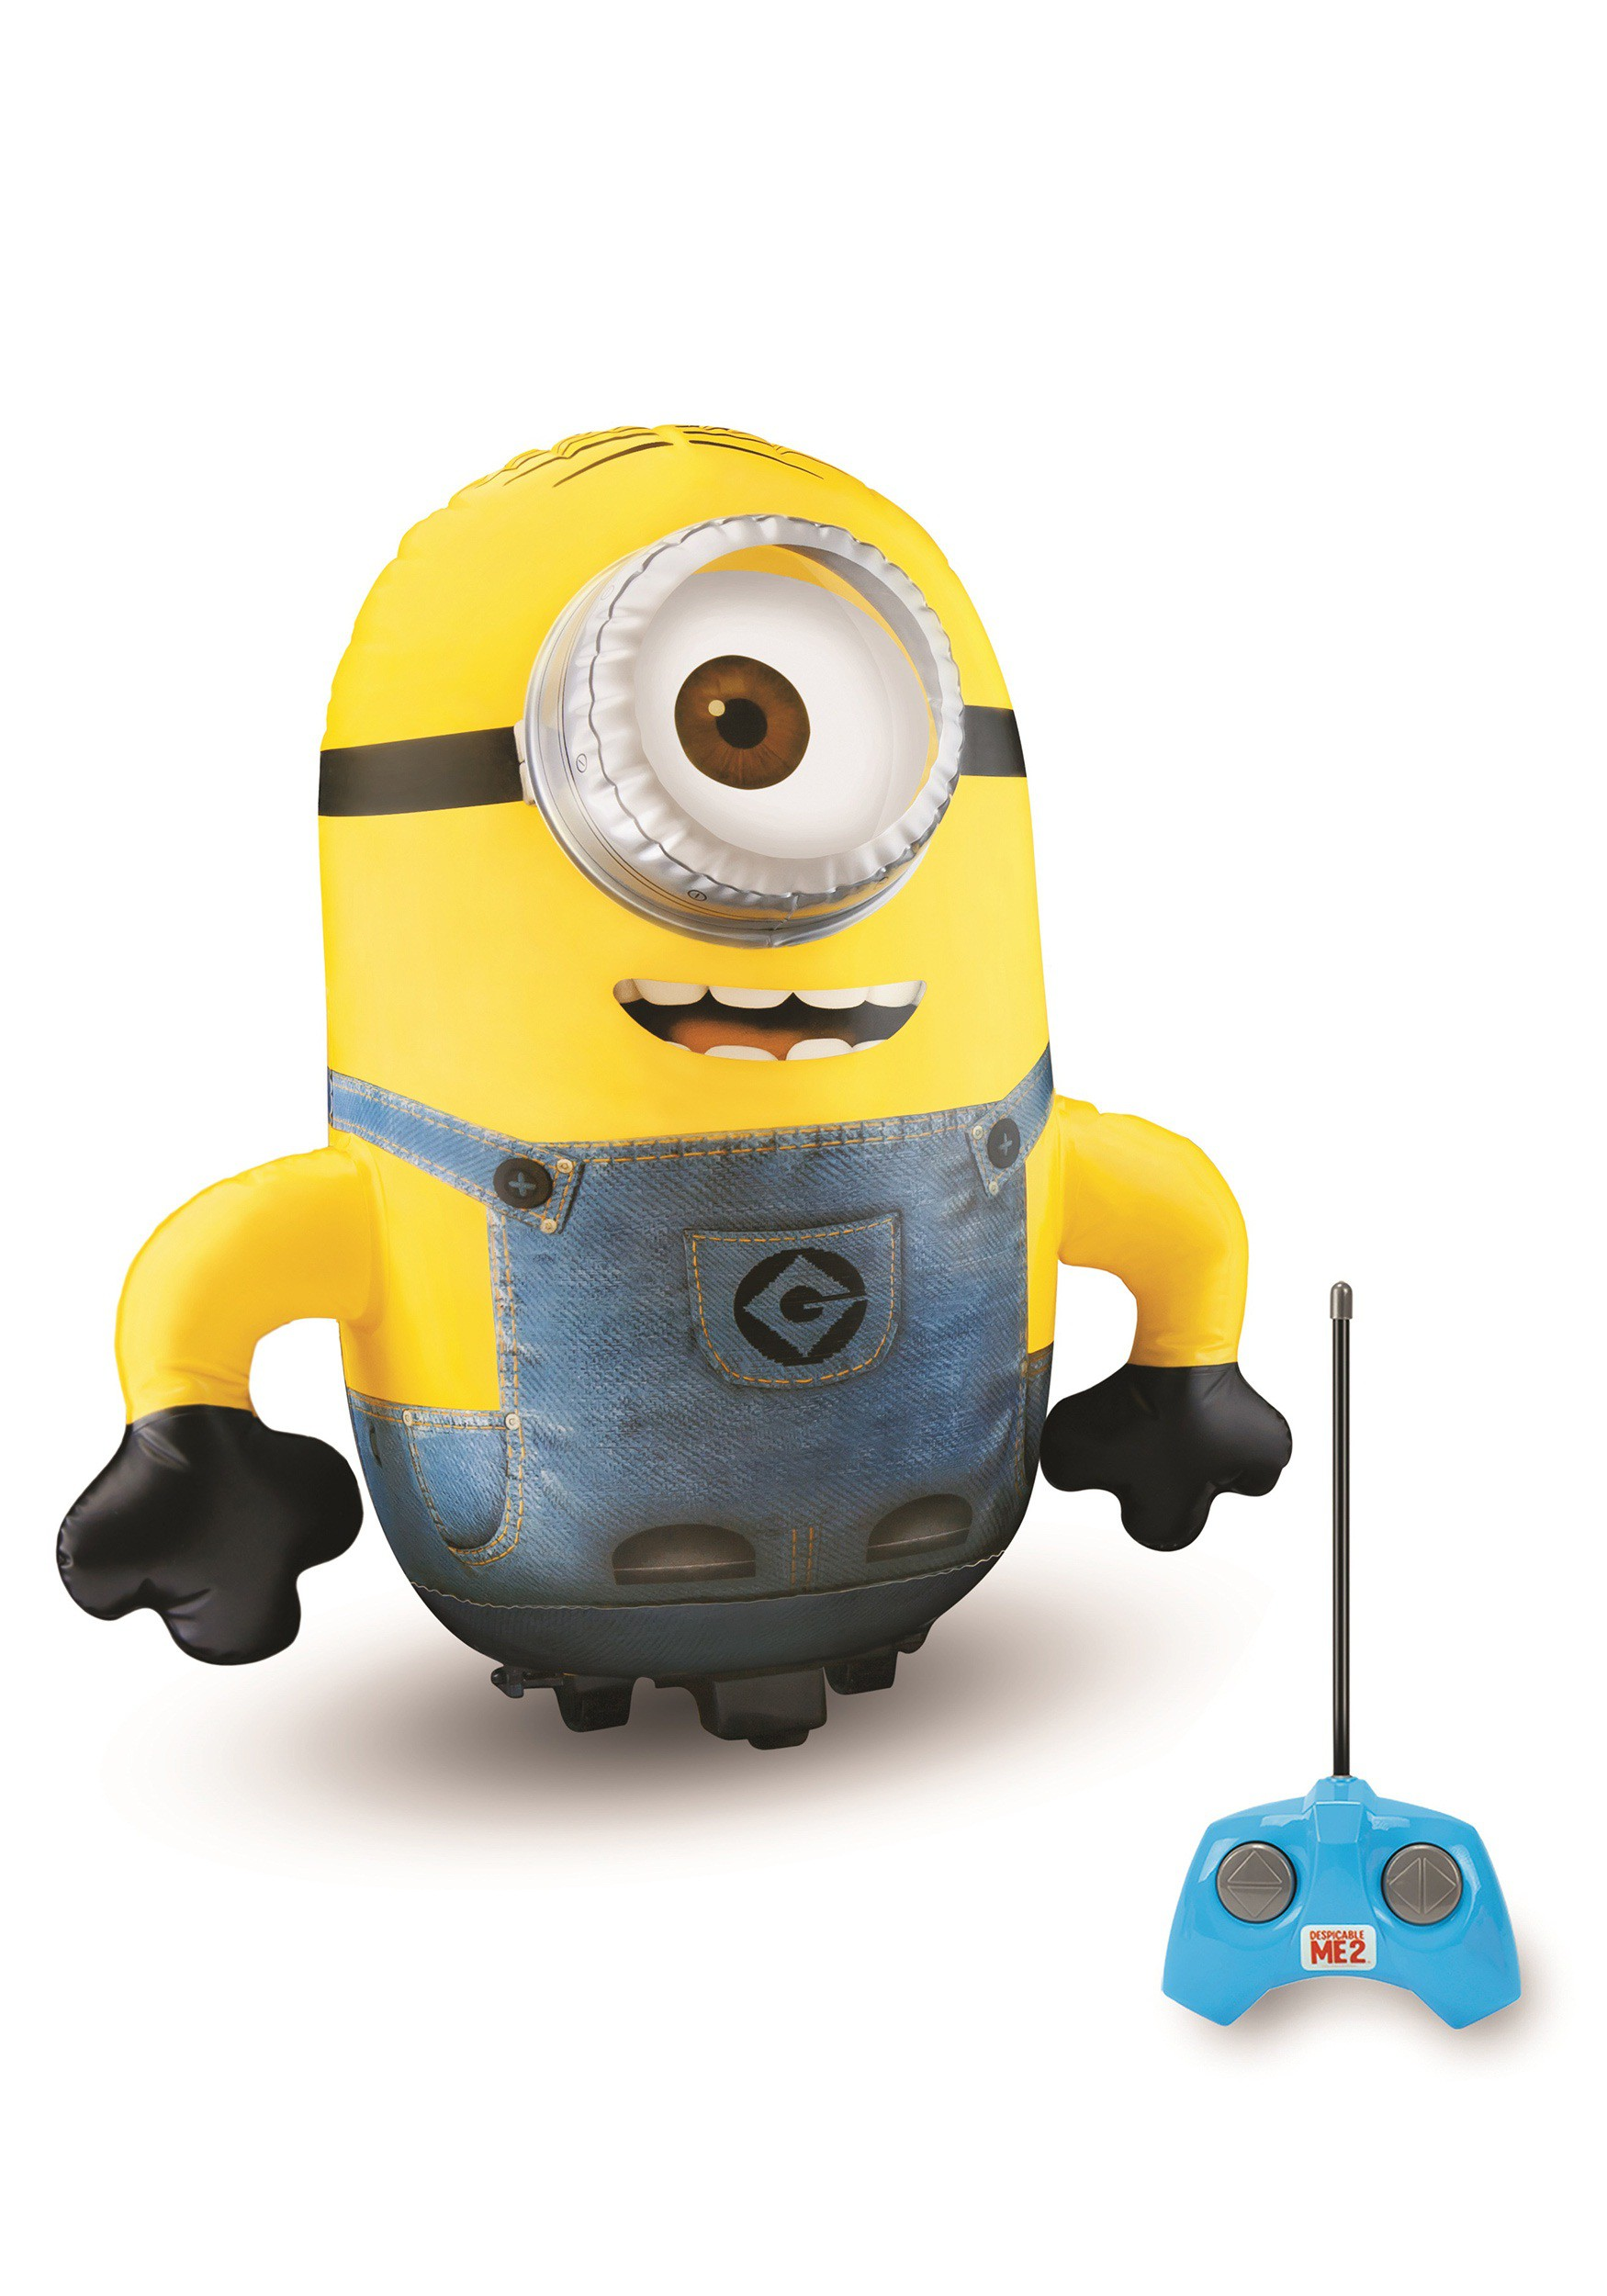 Stuart Minion Inflatable Remote Control Toy